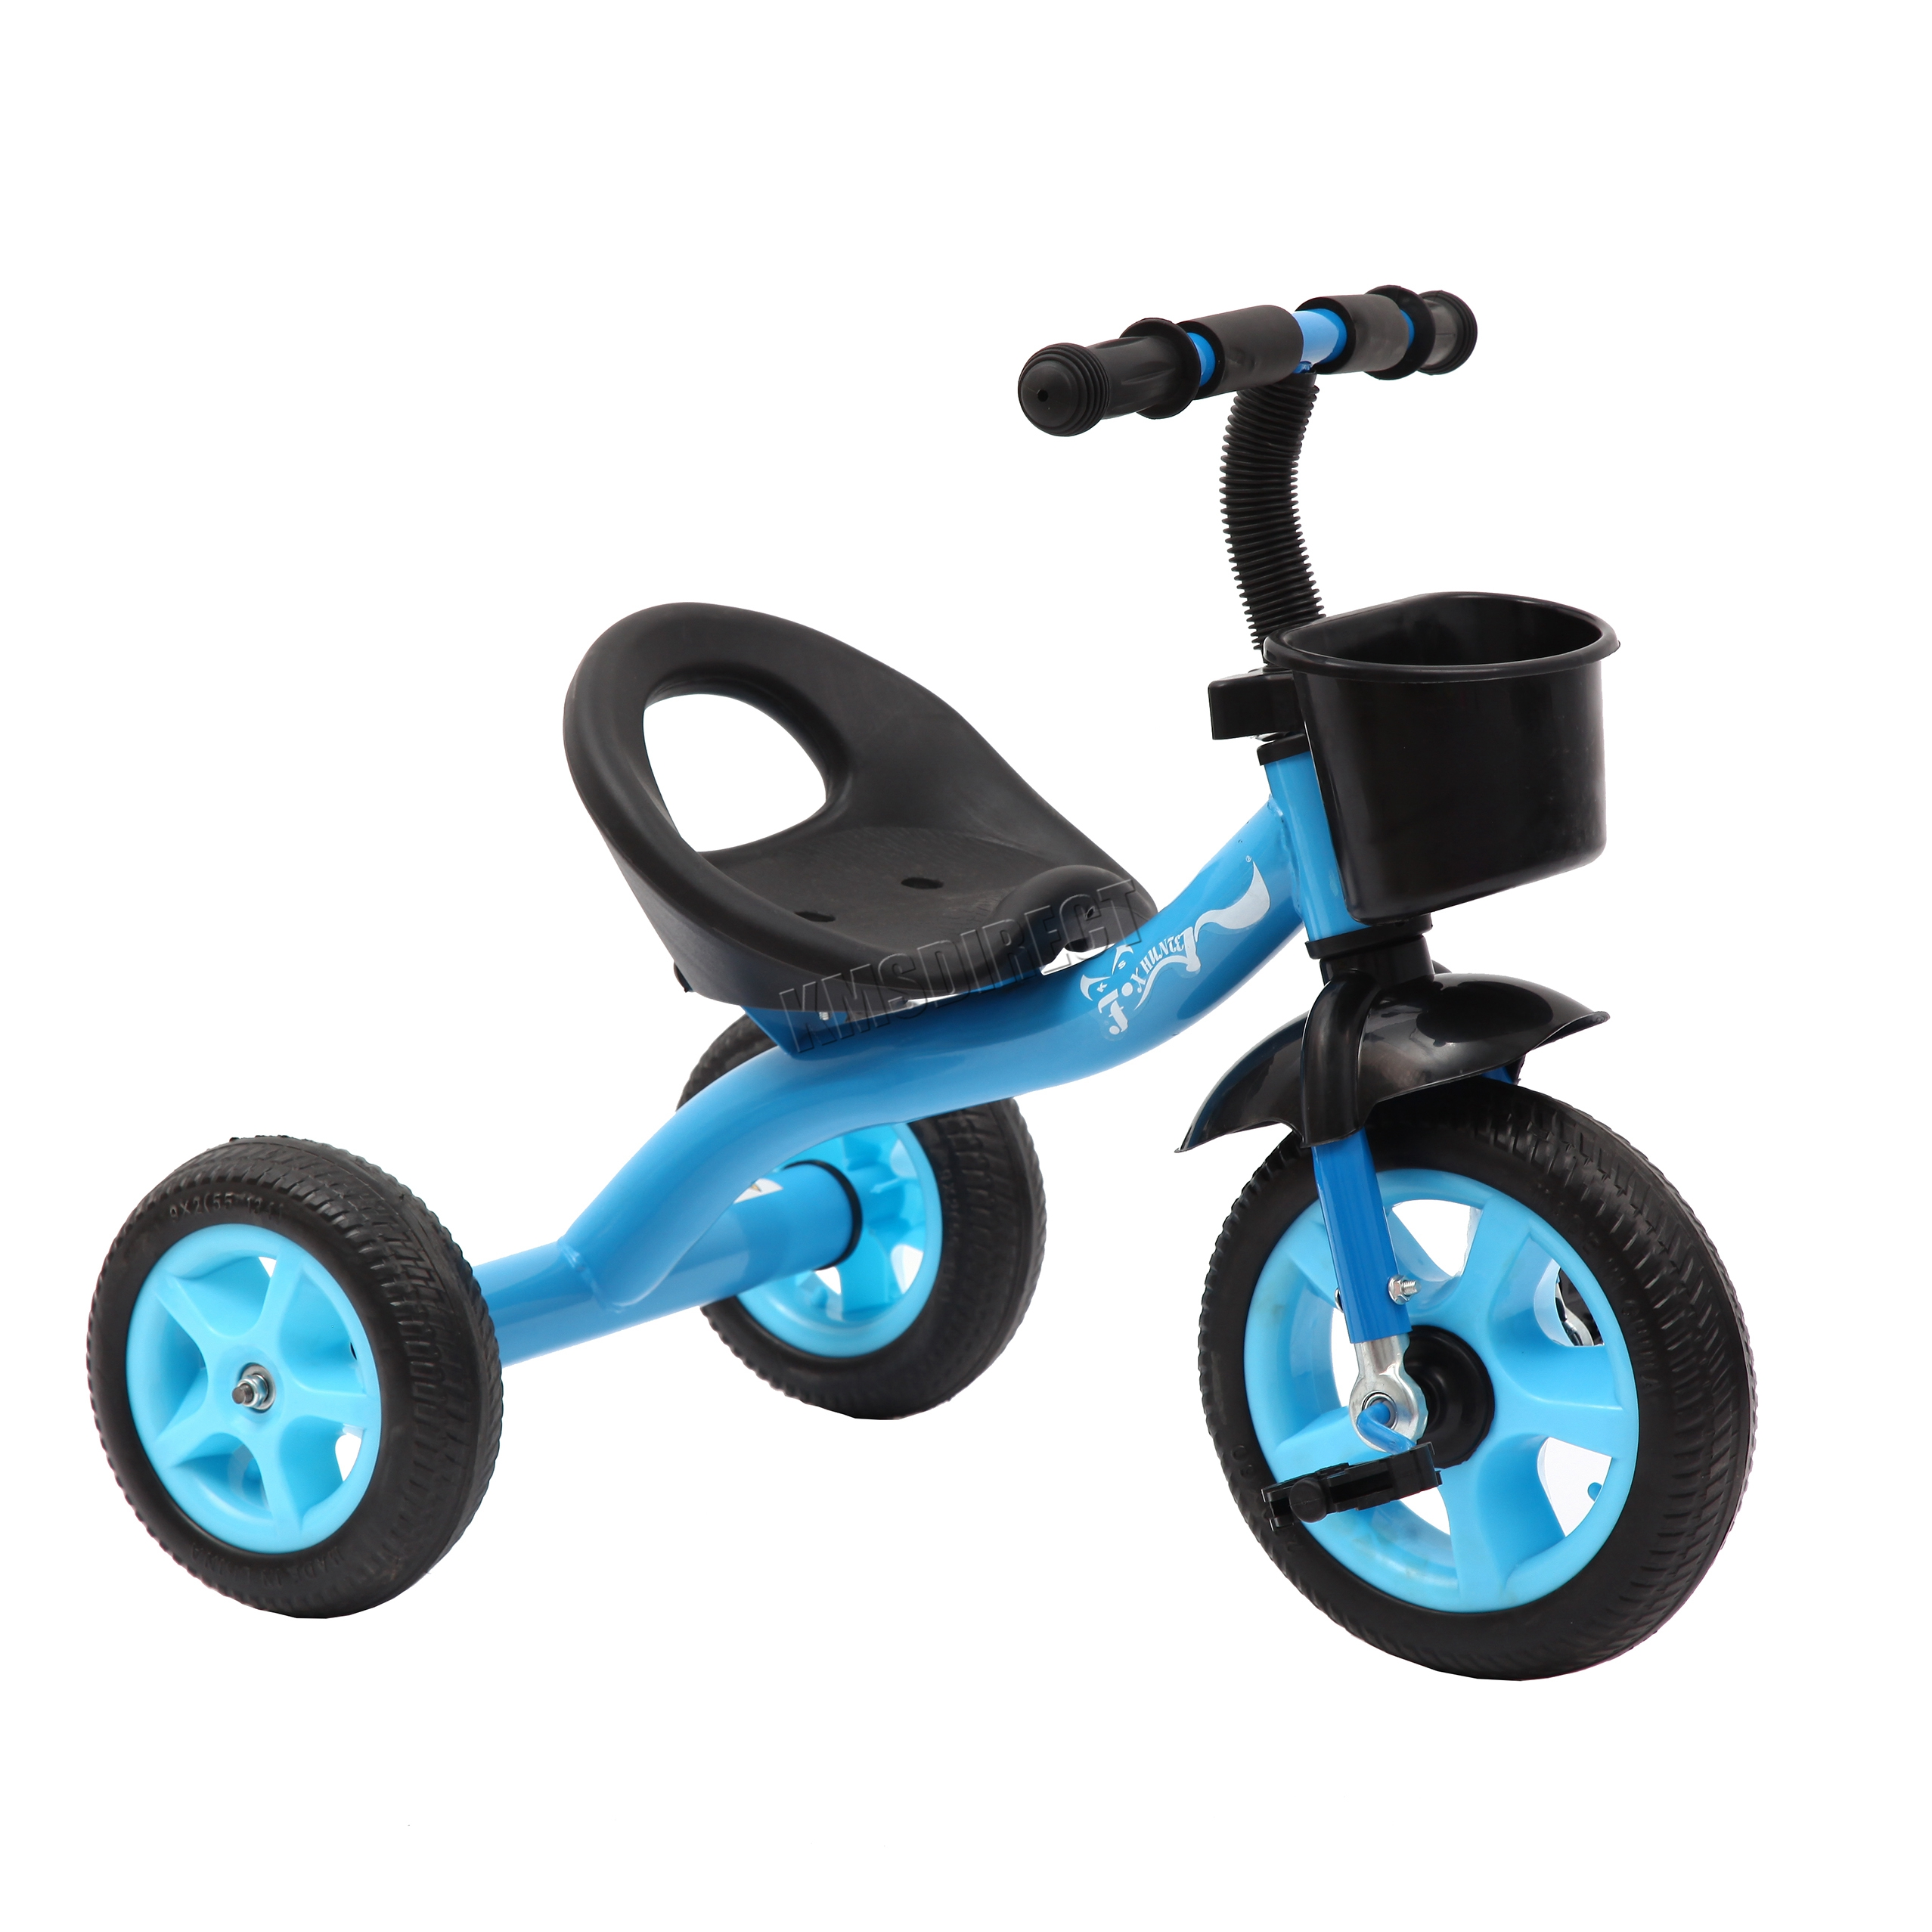 foxhunter kids child children trike tricycle 3 wheeler. Black Bedroom Furniture Sets. Home Design Ideas